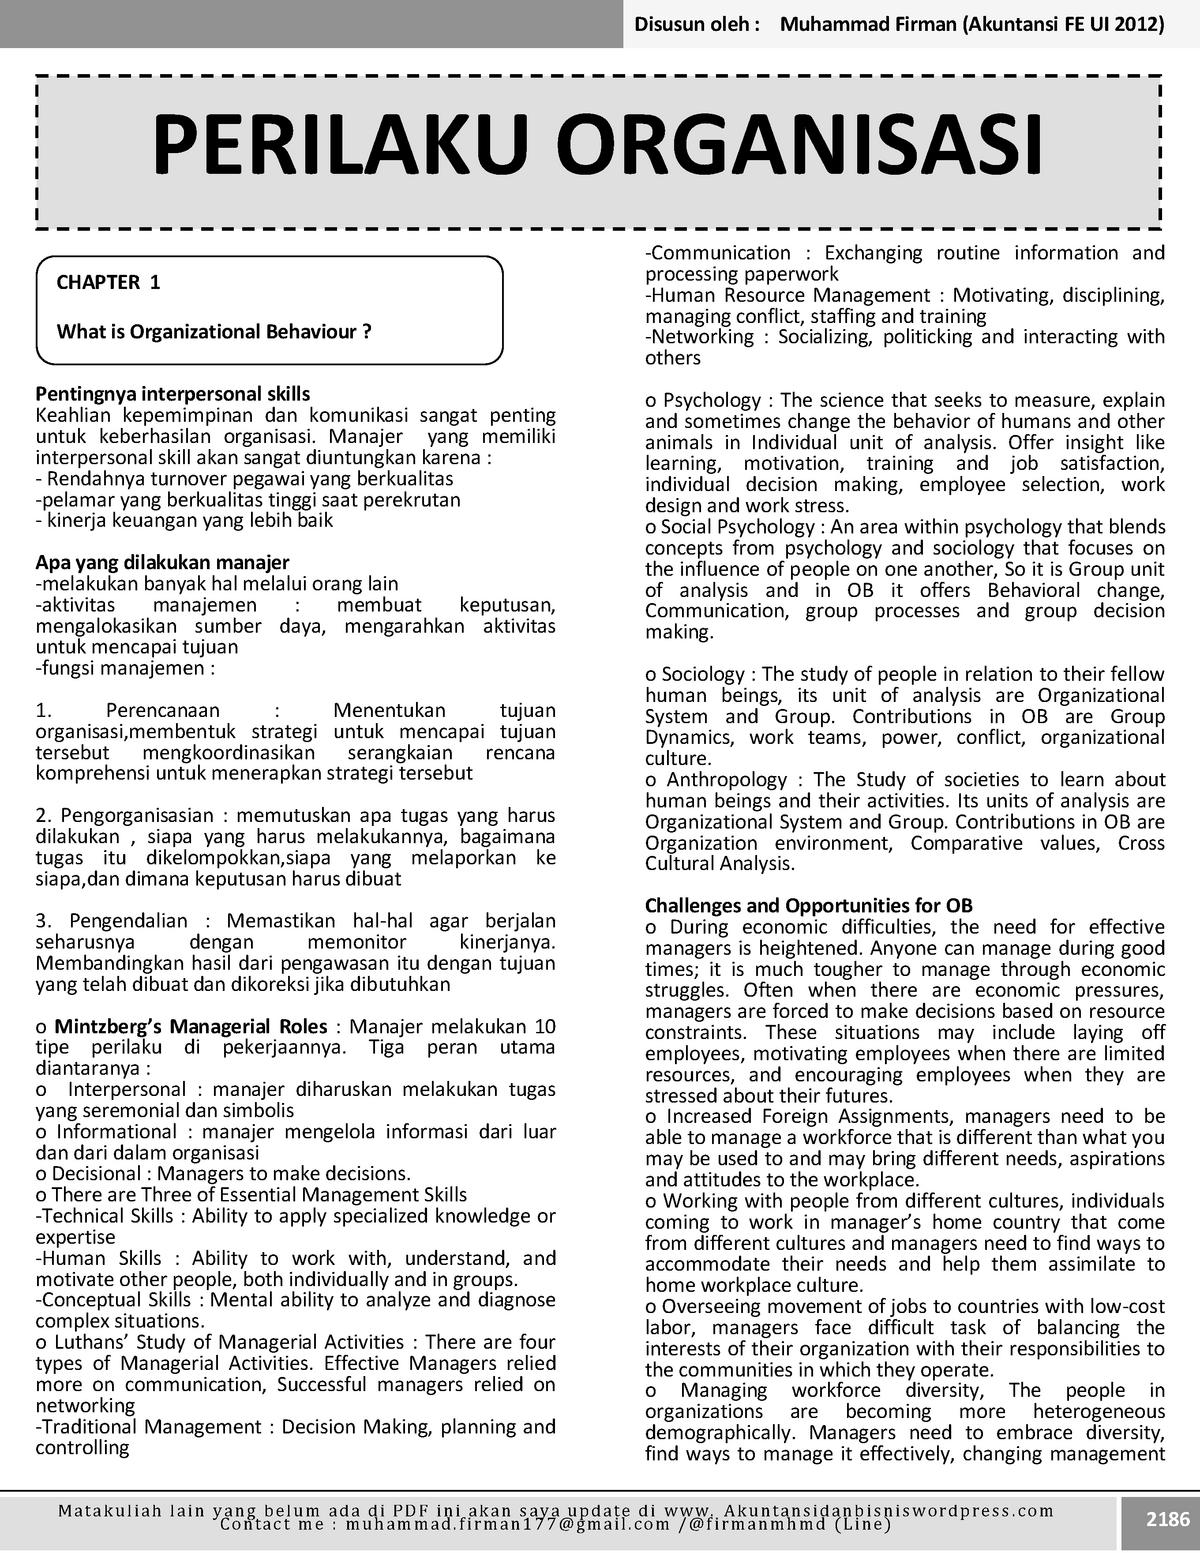 Summary Organizational Behavior Complete Chapters - MN - StuDocu